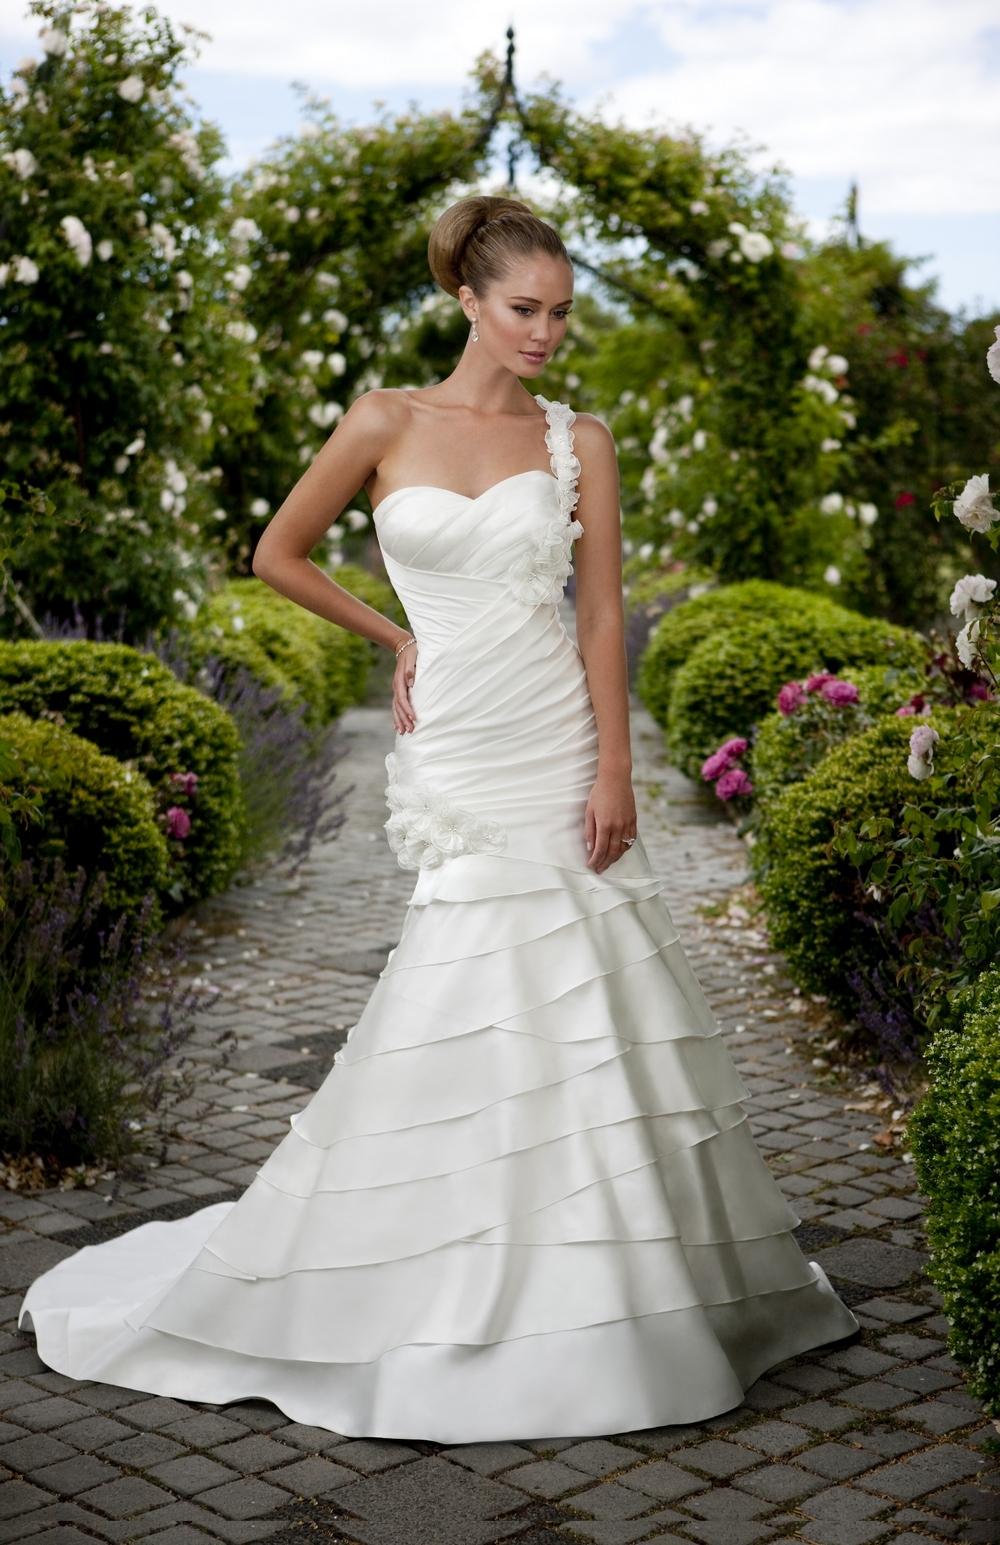 Essense-of-australia-wedding-dresses-2010-2011-d1101.full